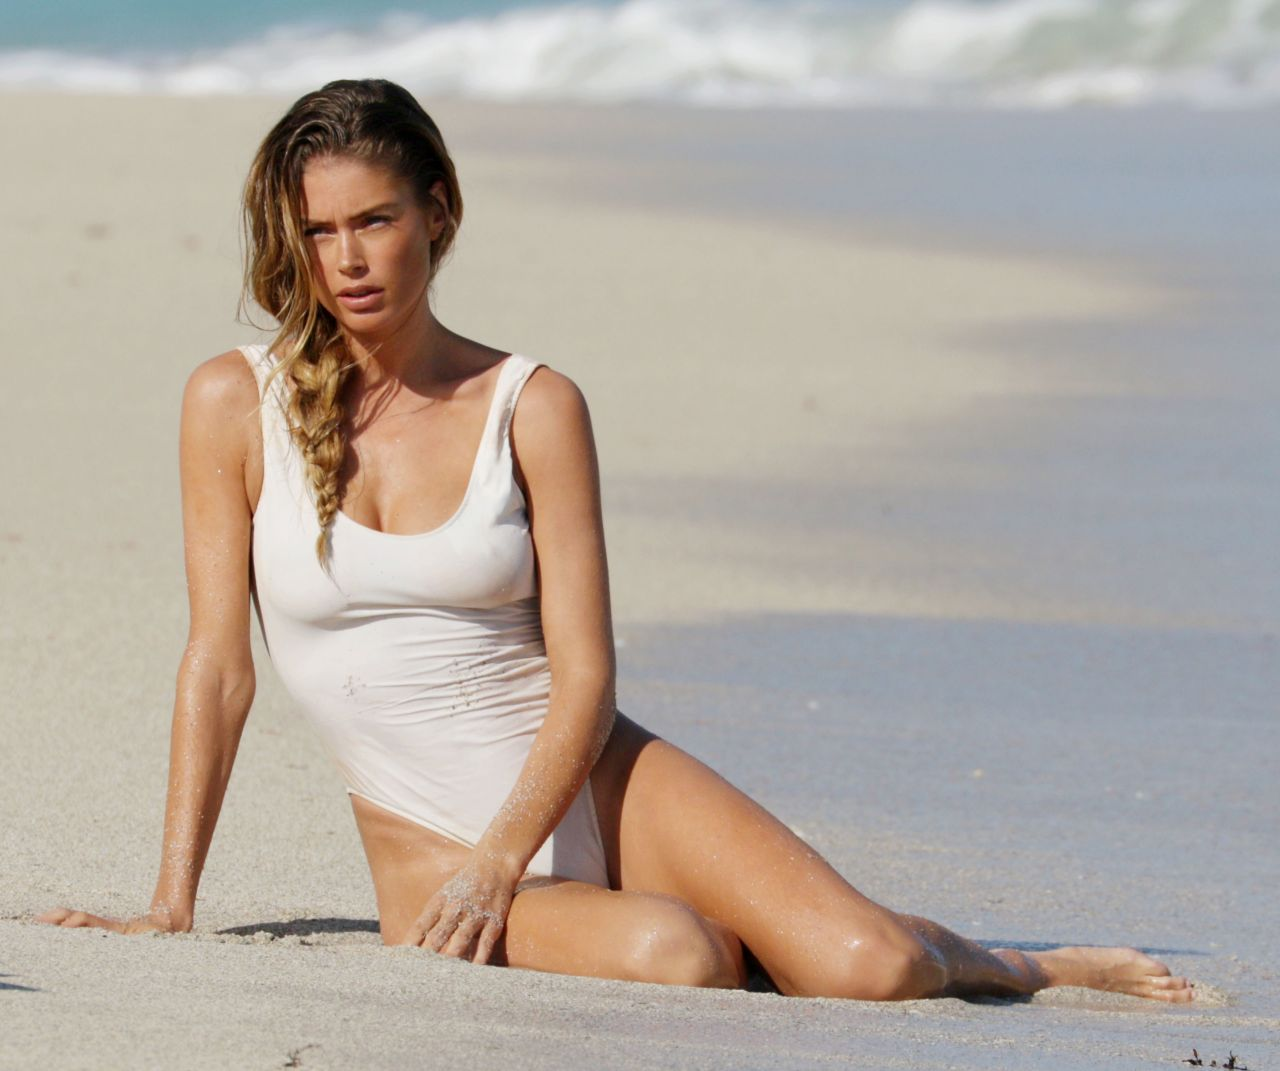 Doutzen Kroes Bikini Bodies Pic 22 of 35